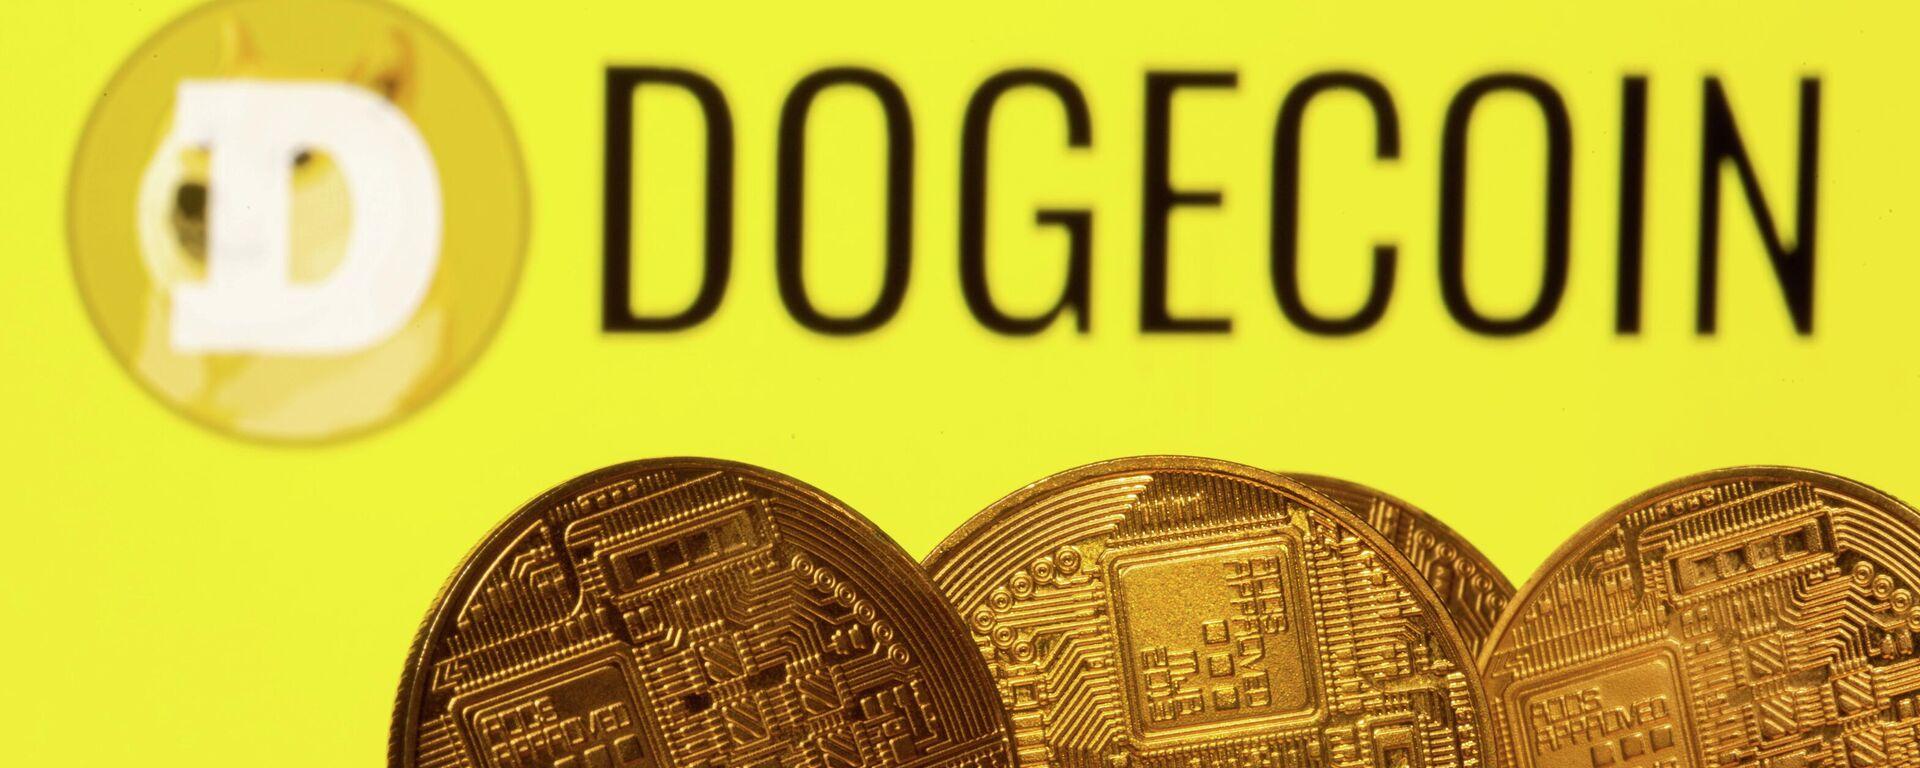 "Cryptowährung ""Dogecoin"" von Elon Musk - SNA, 1920, 11.05.2021"